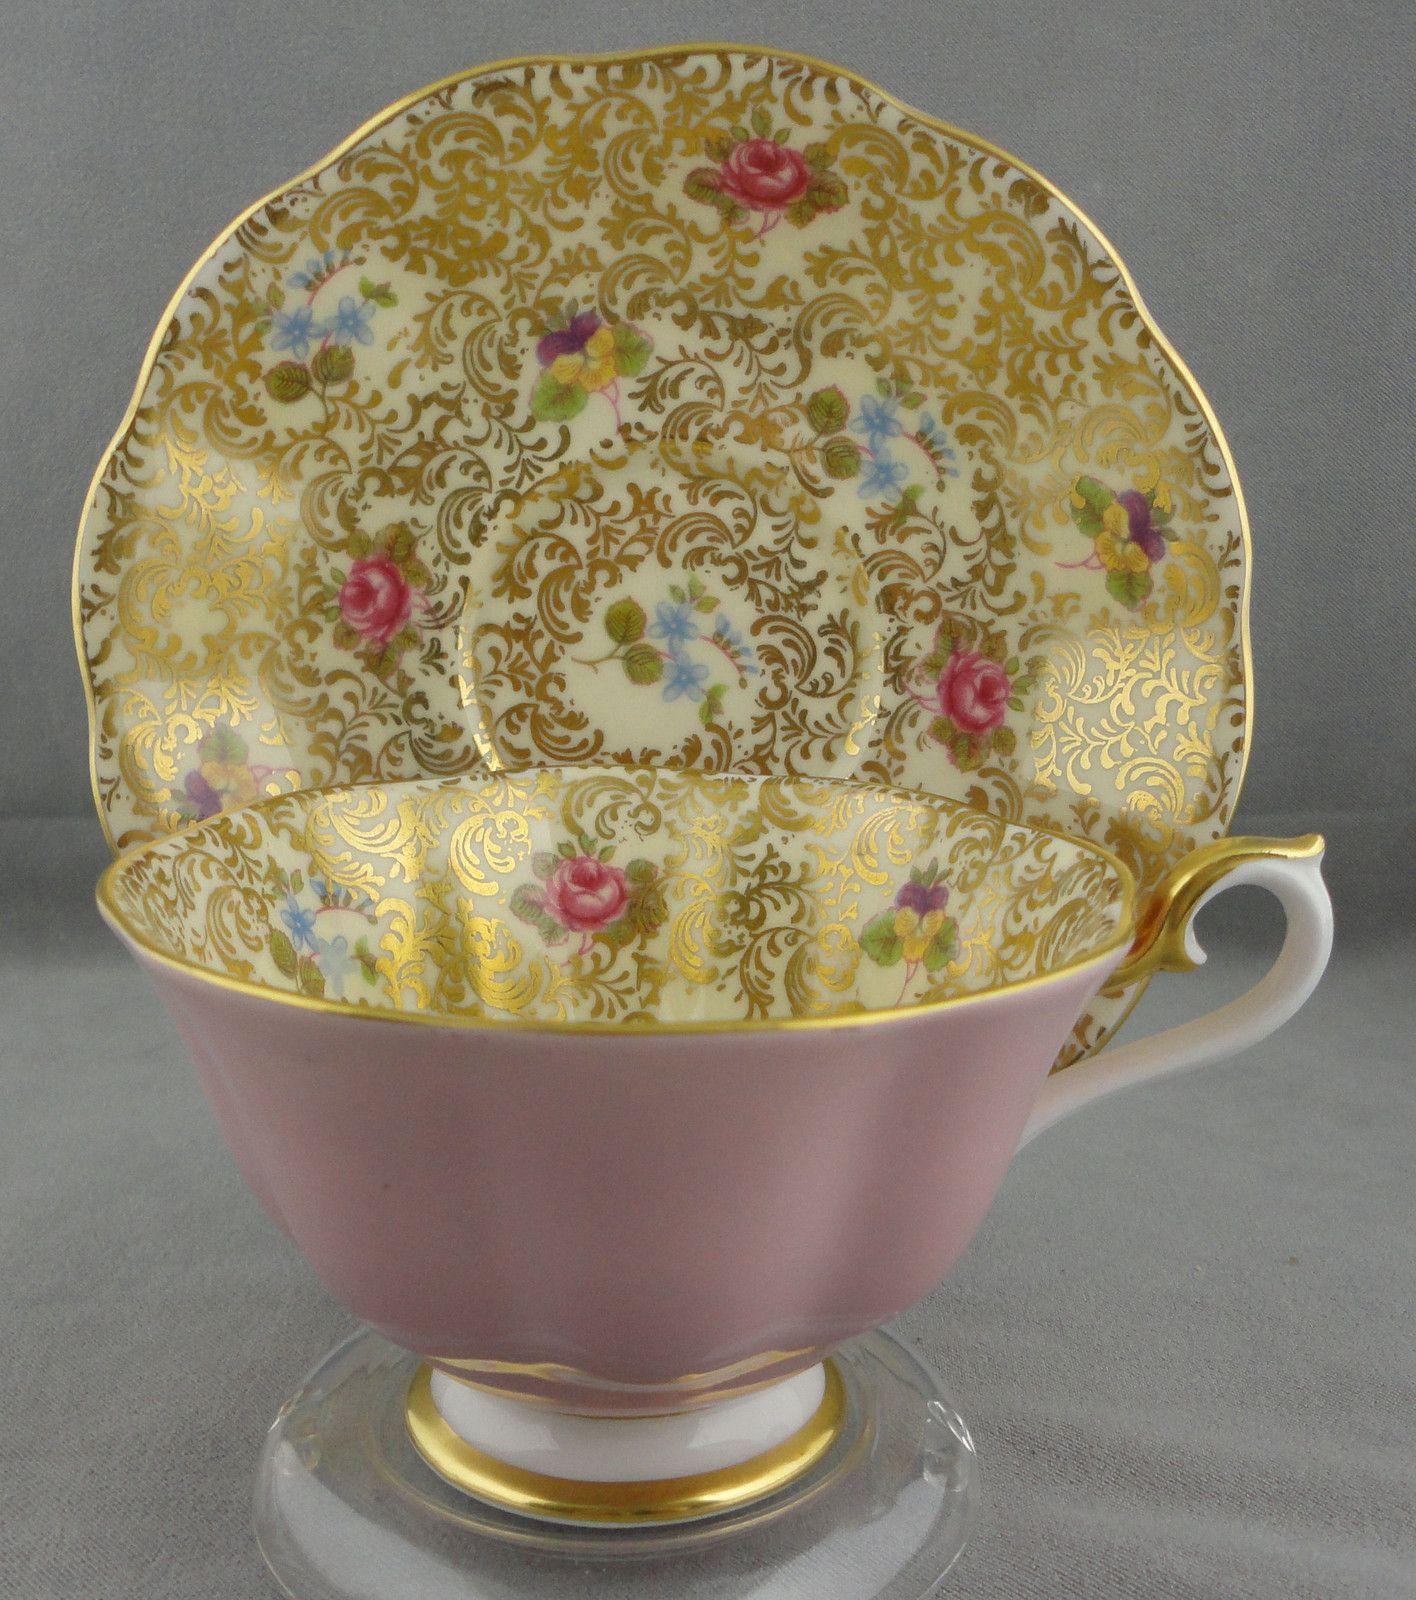 royal albert princess series teacup and saucer teacups pinterest porzellan royal albert. Black Bedroom Furniture Sets. Home Design Ideas